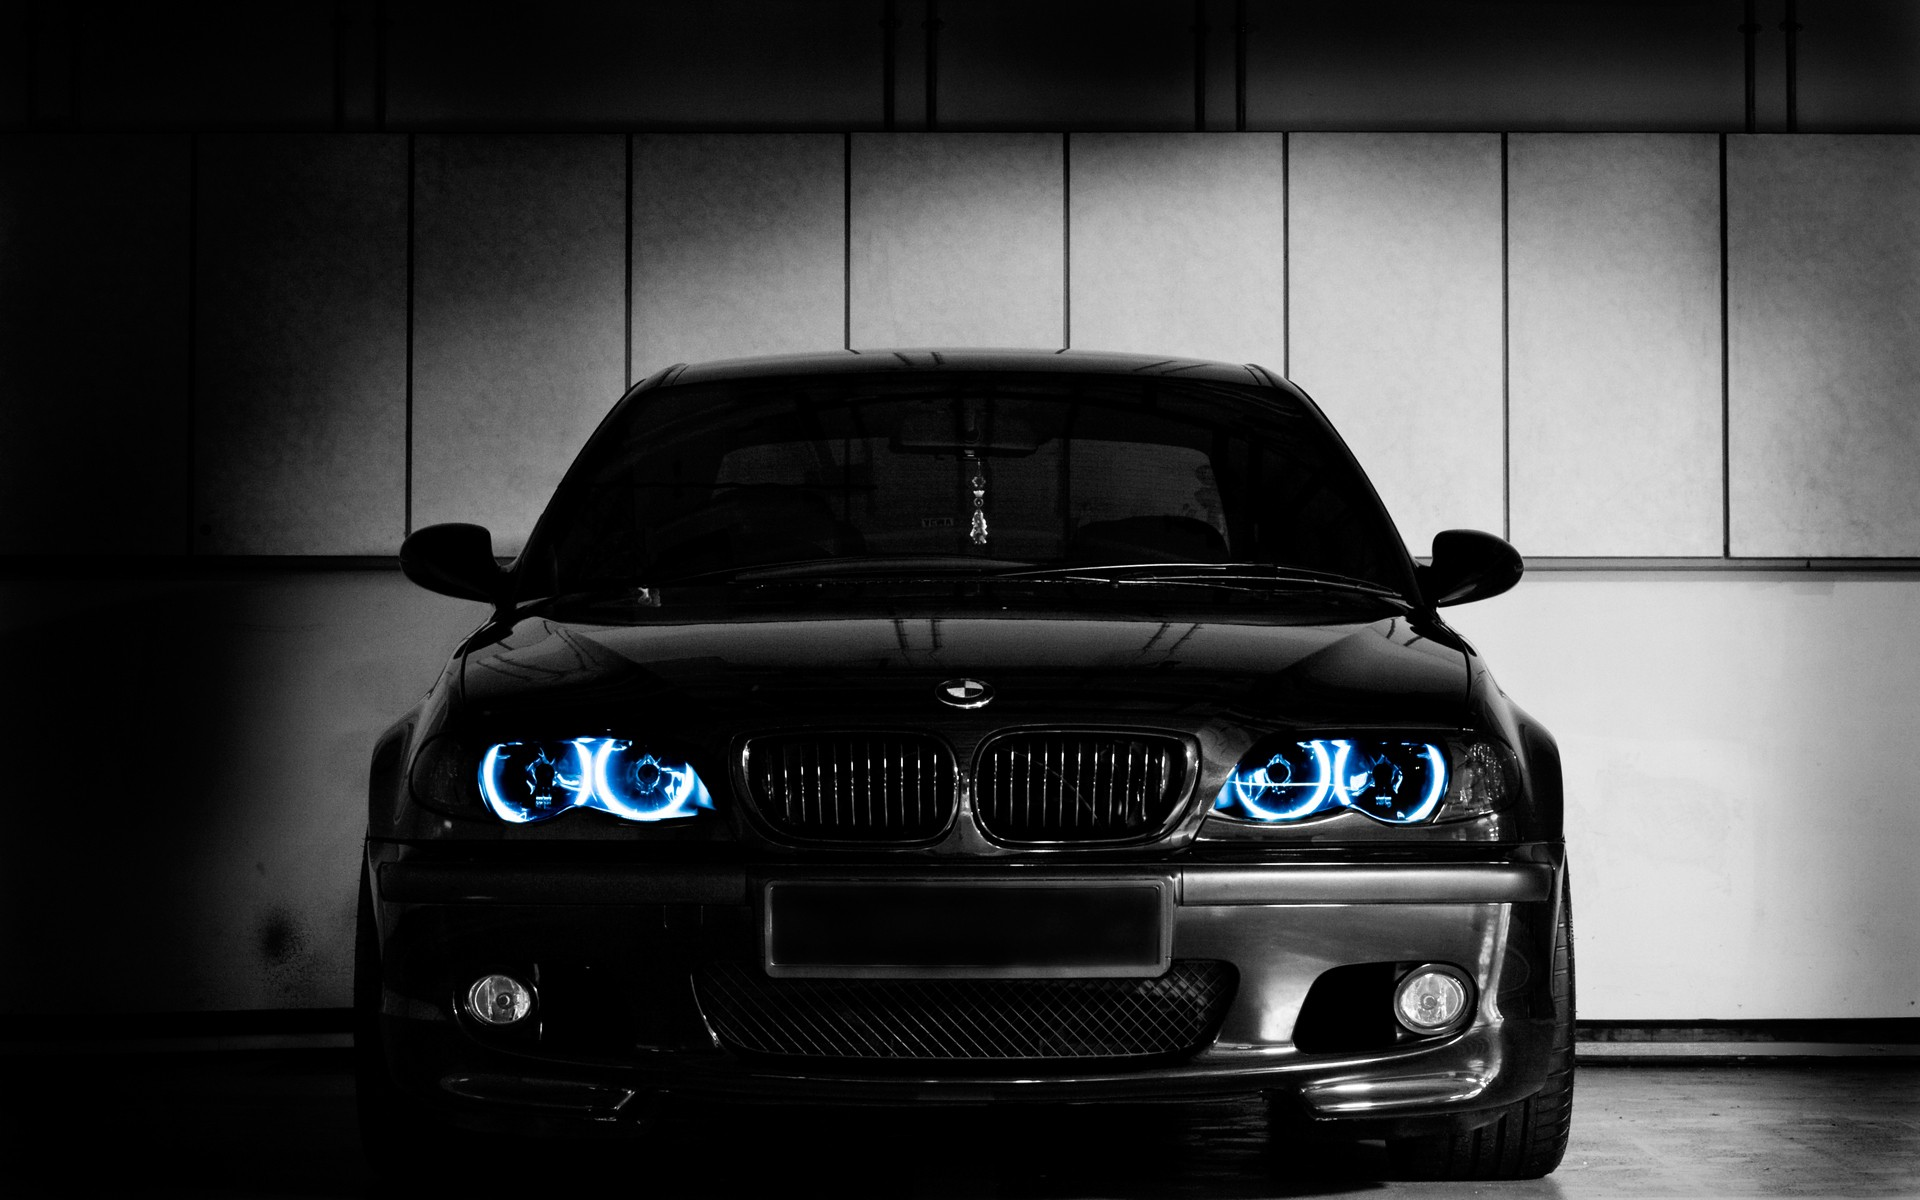 BMW cars vehicles BMW E46 black cars wallpaper | 1920x1200 ...